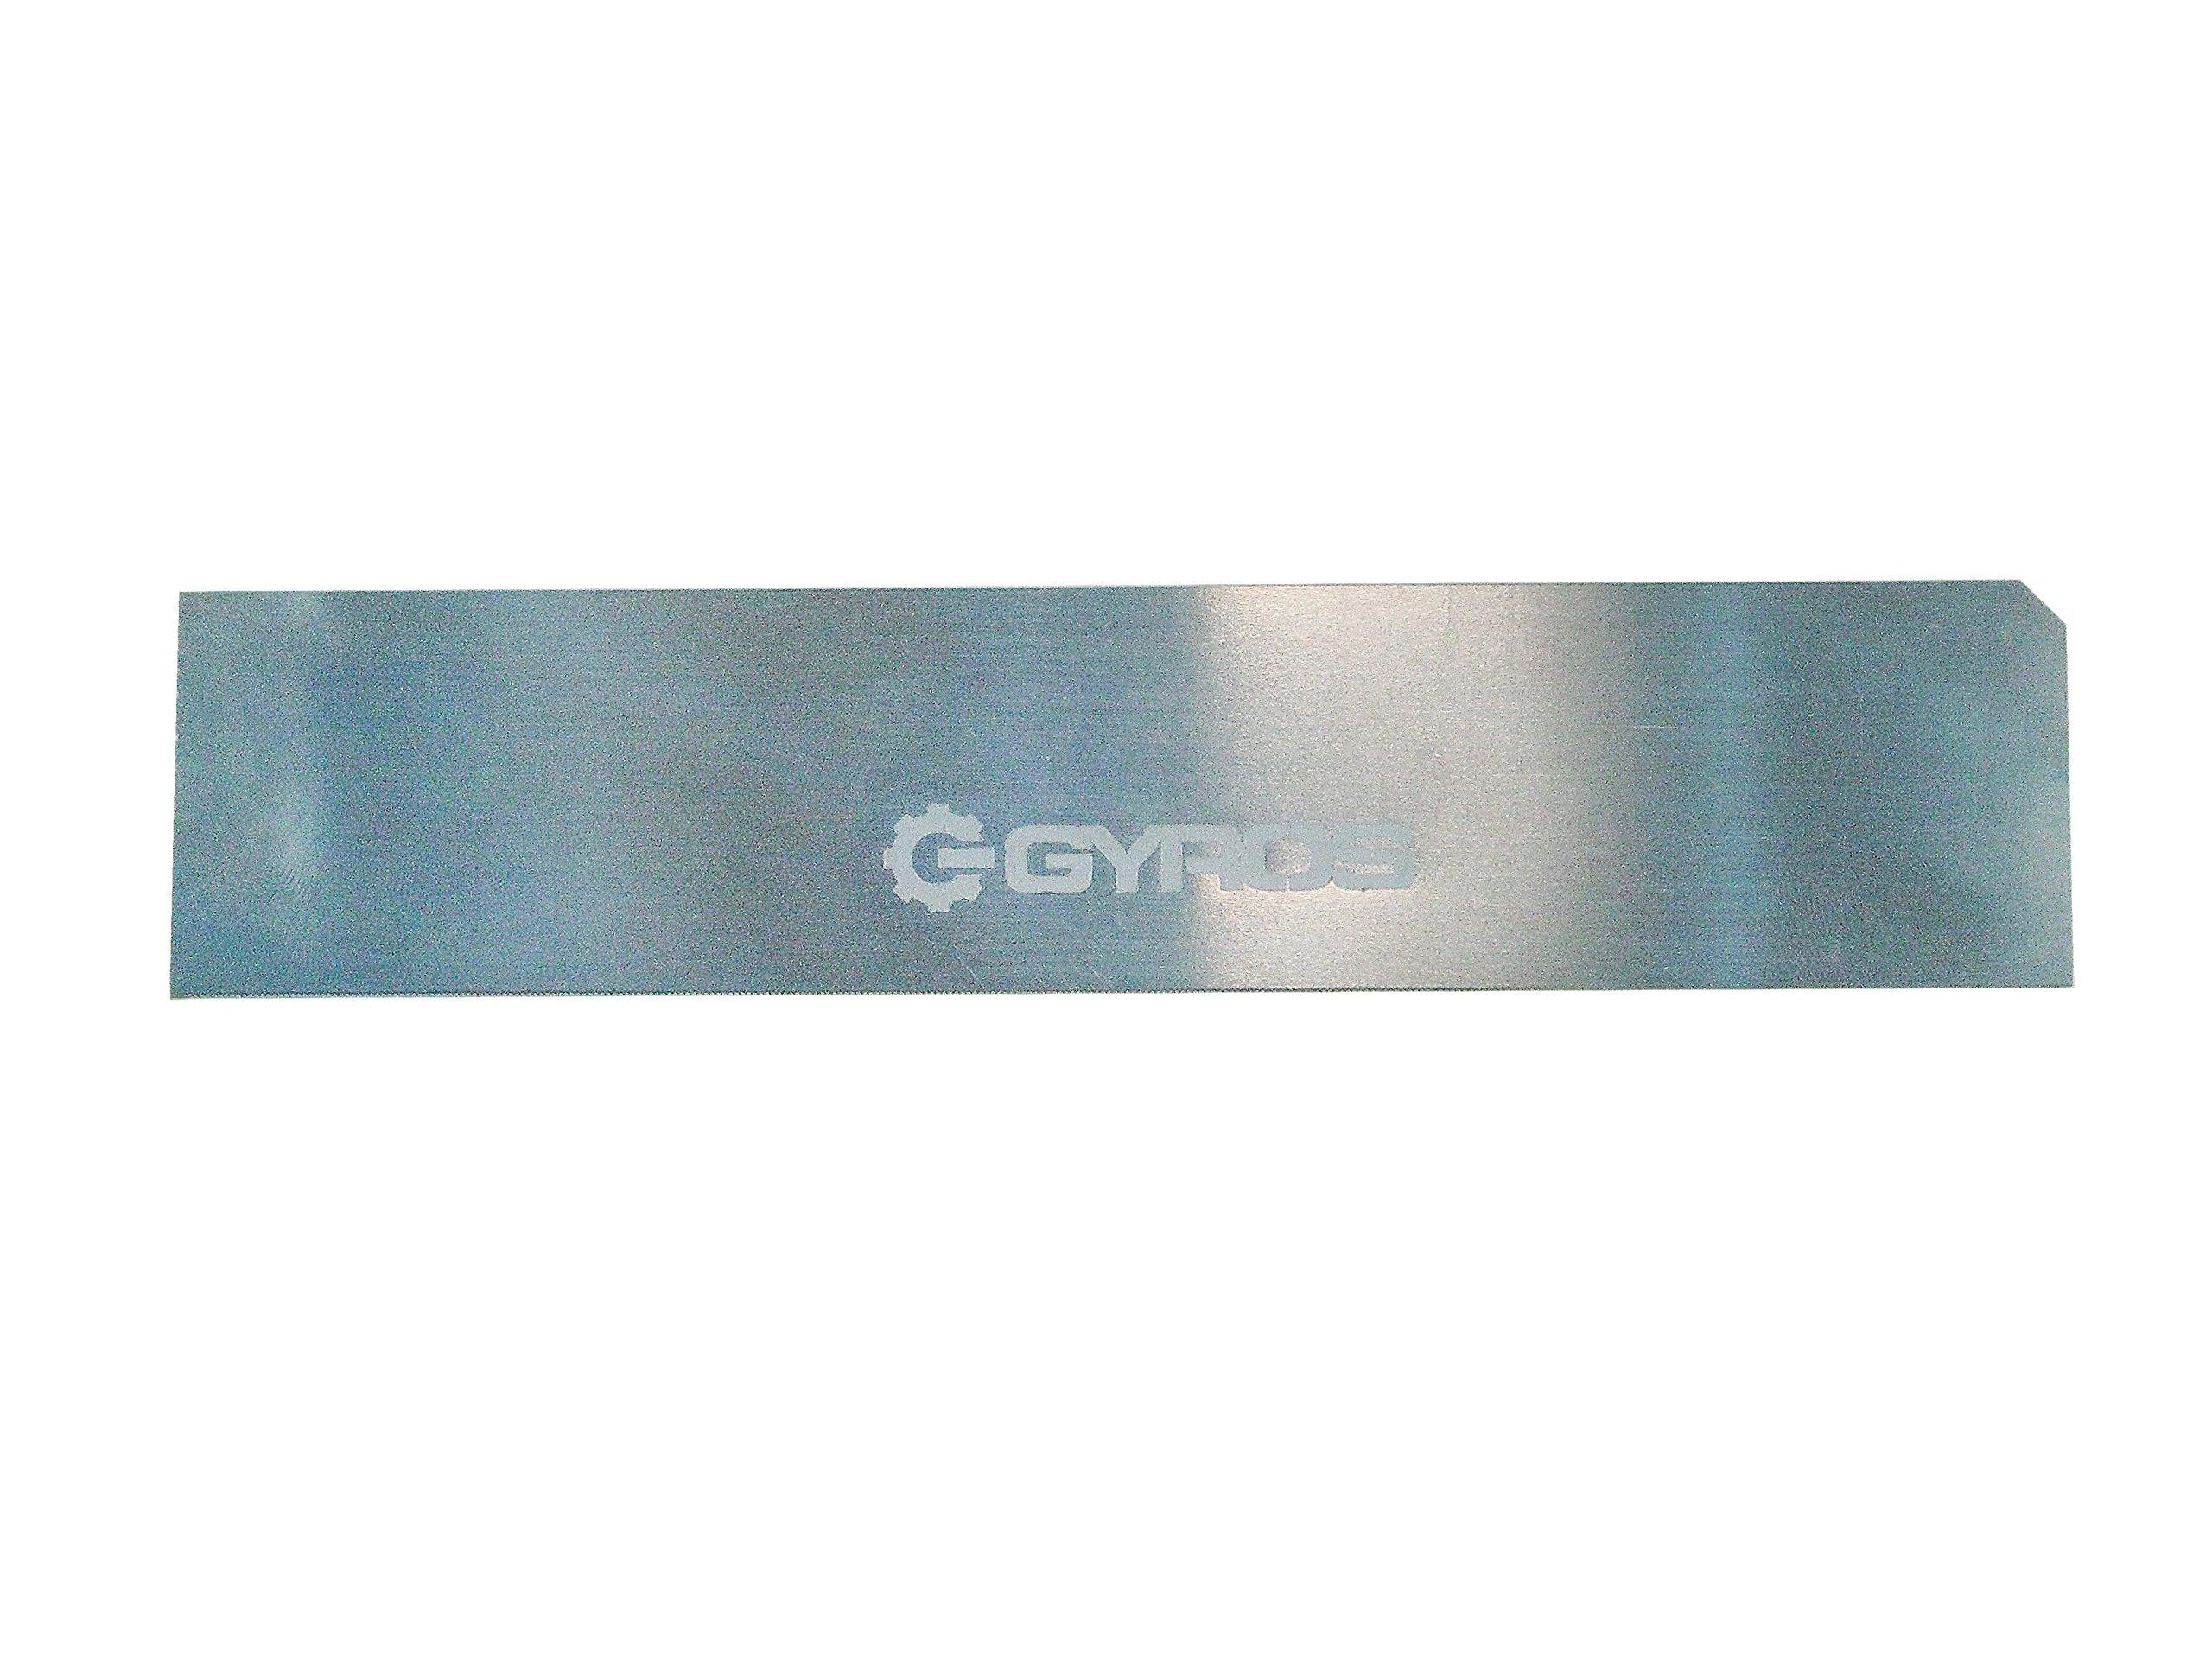 Gyros 84-16008 Razor Saw Replacement Blade